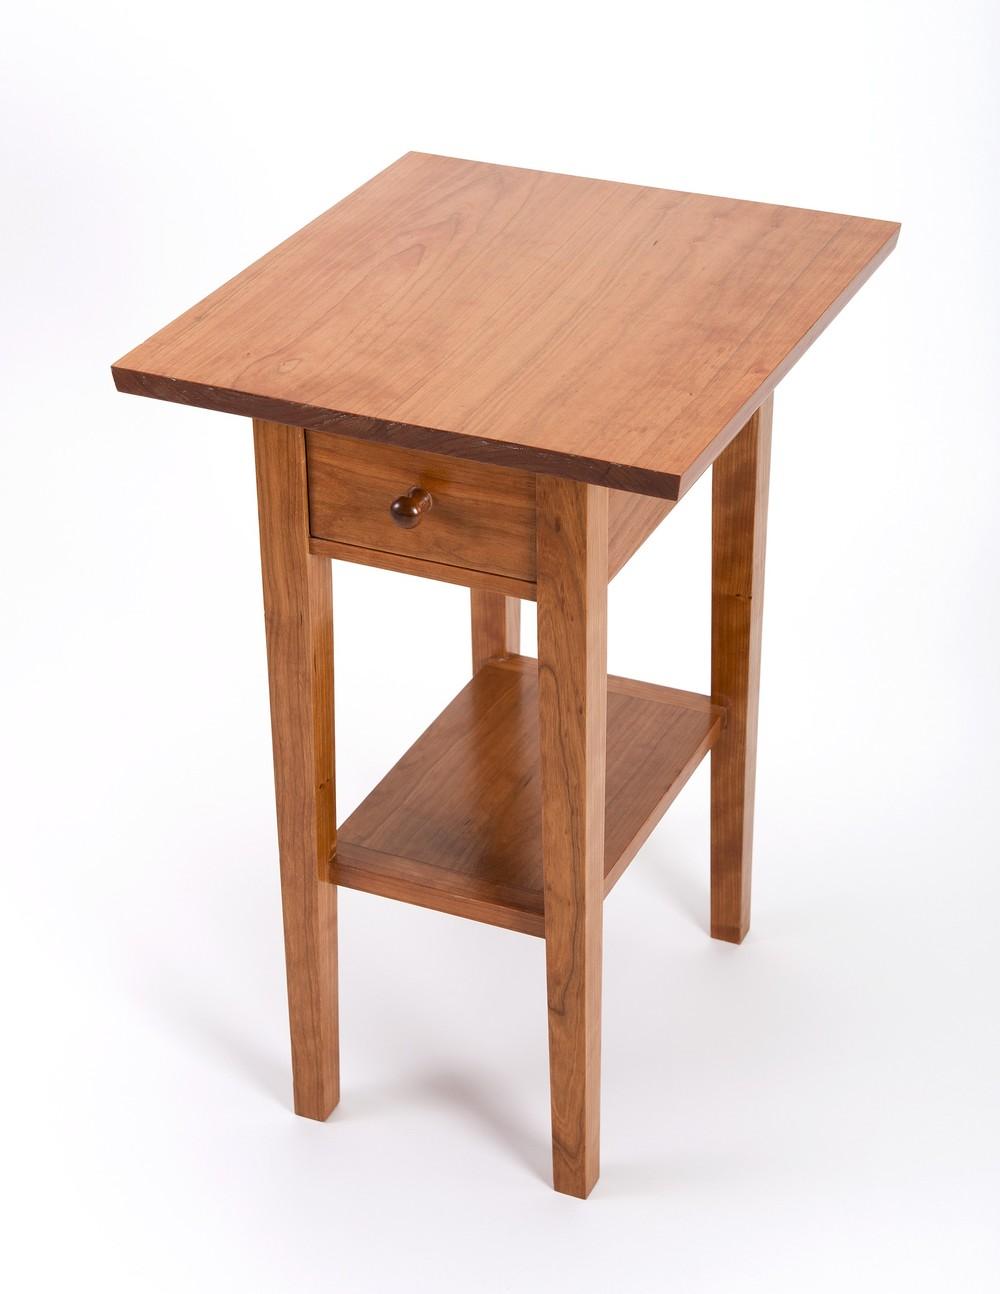 Furniture005.jpg